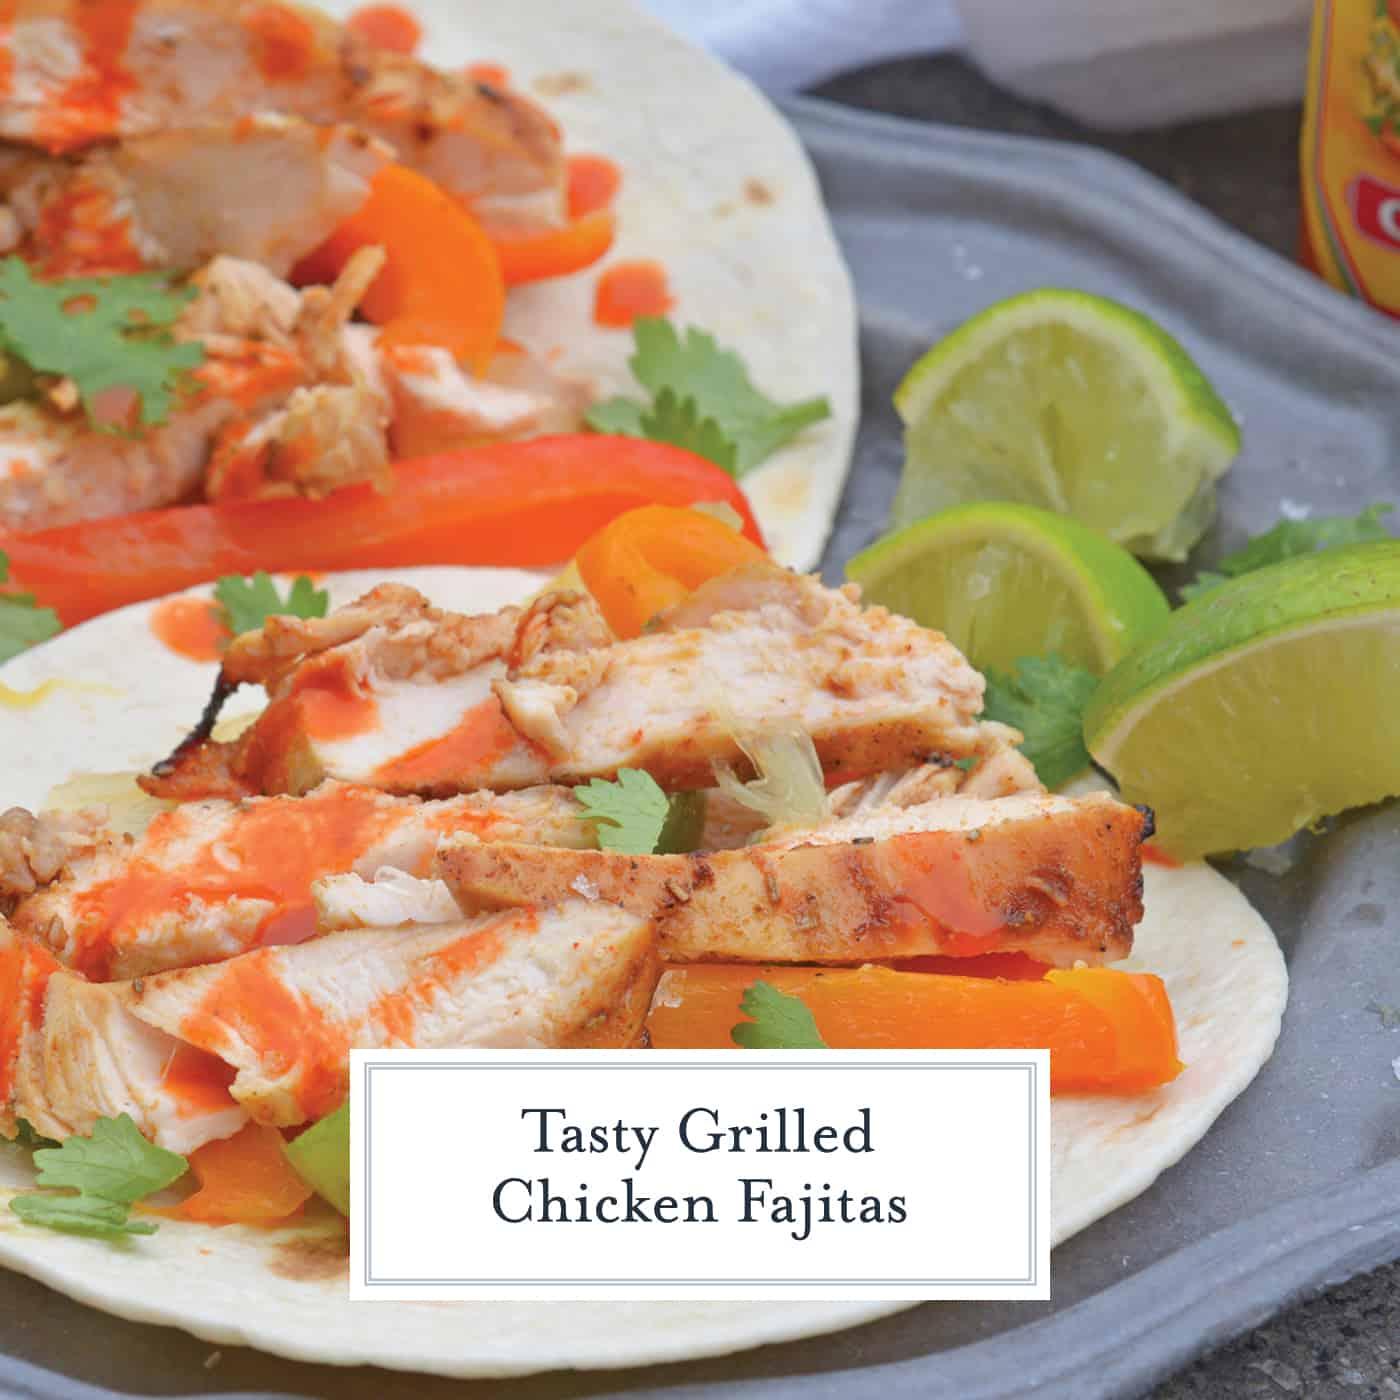 Grilled Chicken Fajitas A Tasty Recipe For Chicken Fajita Seasoning